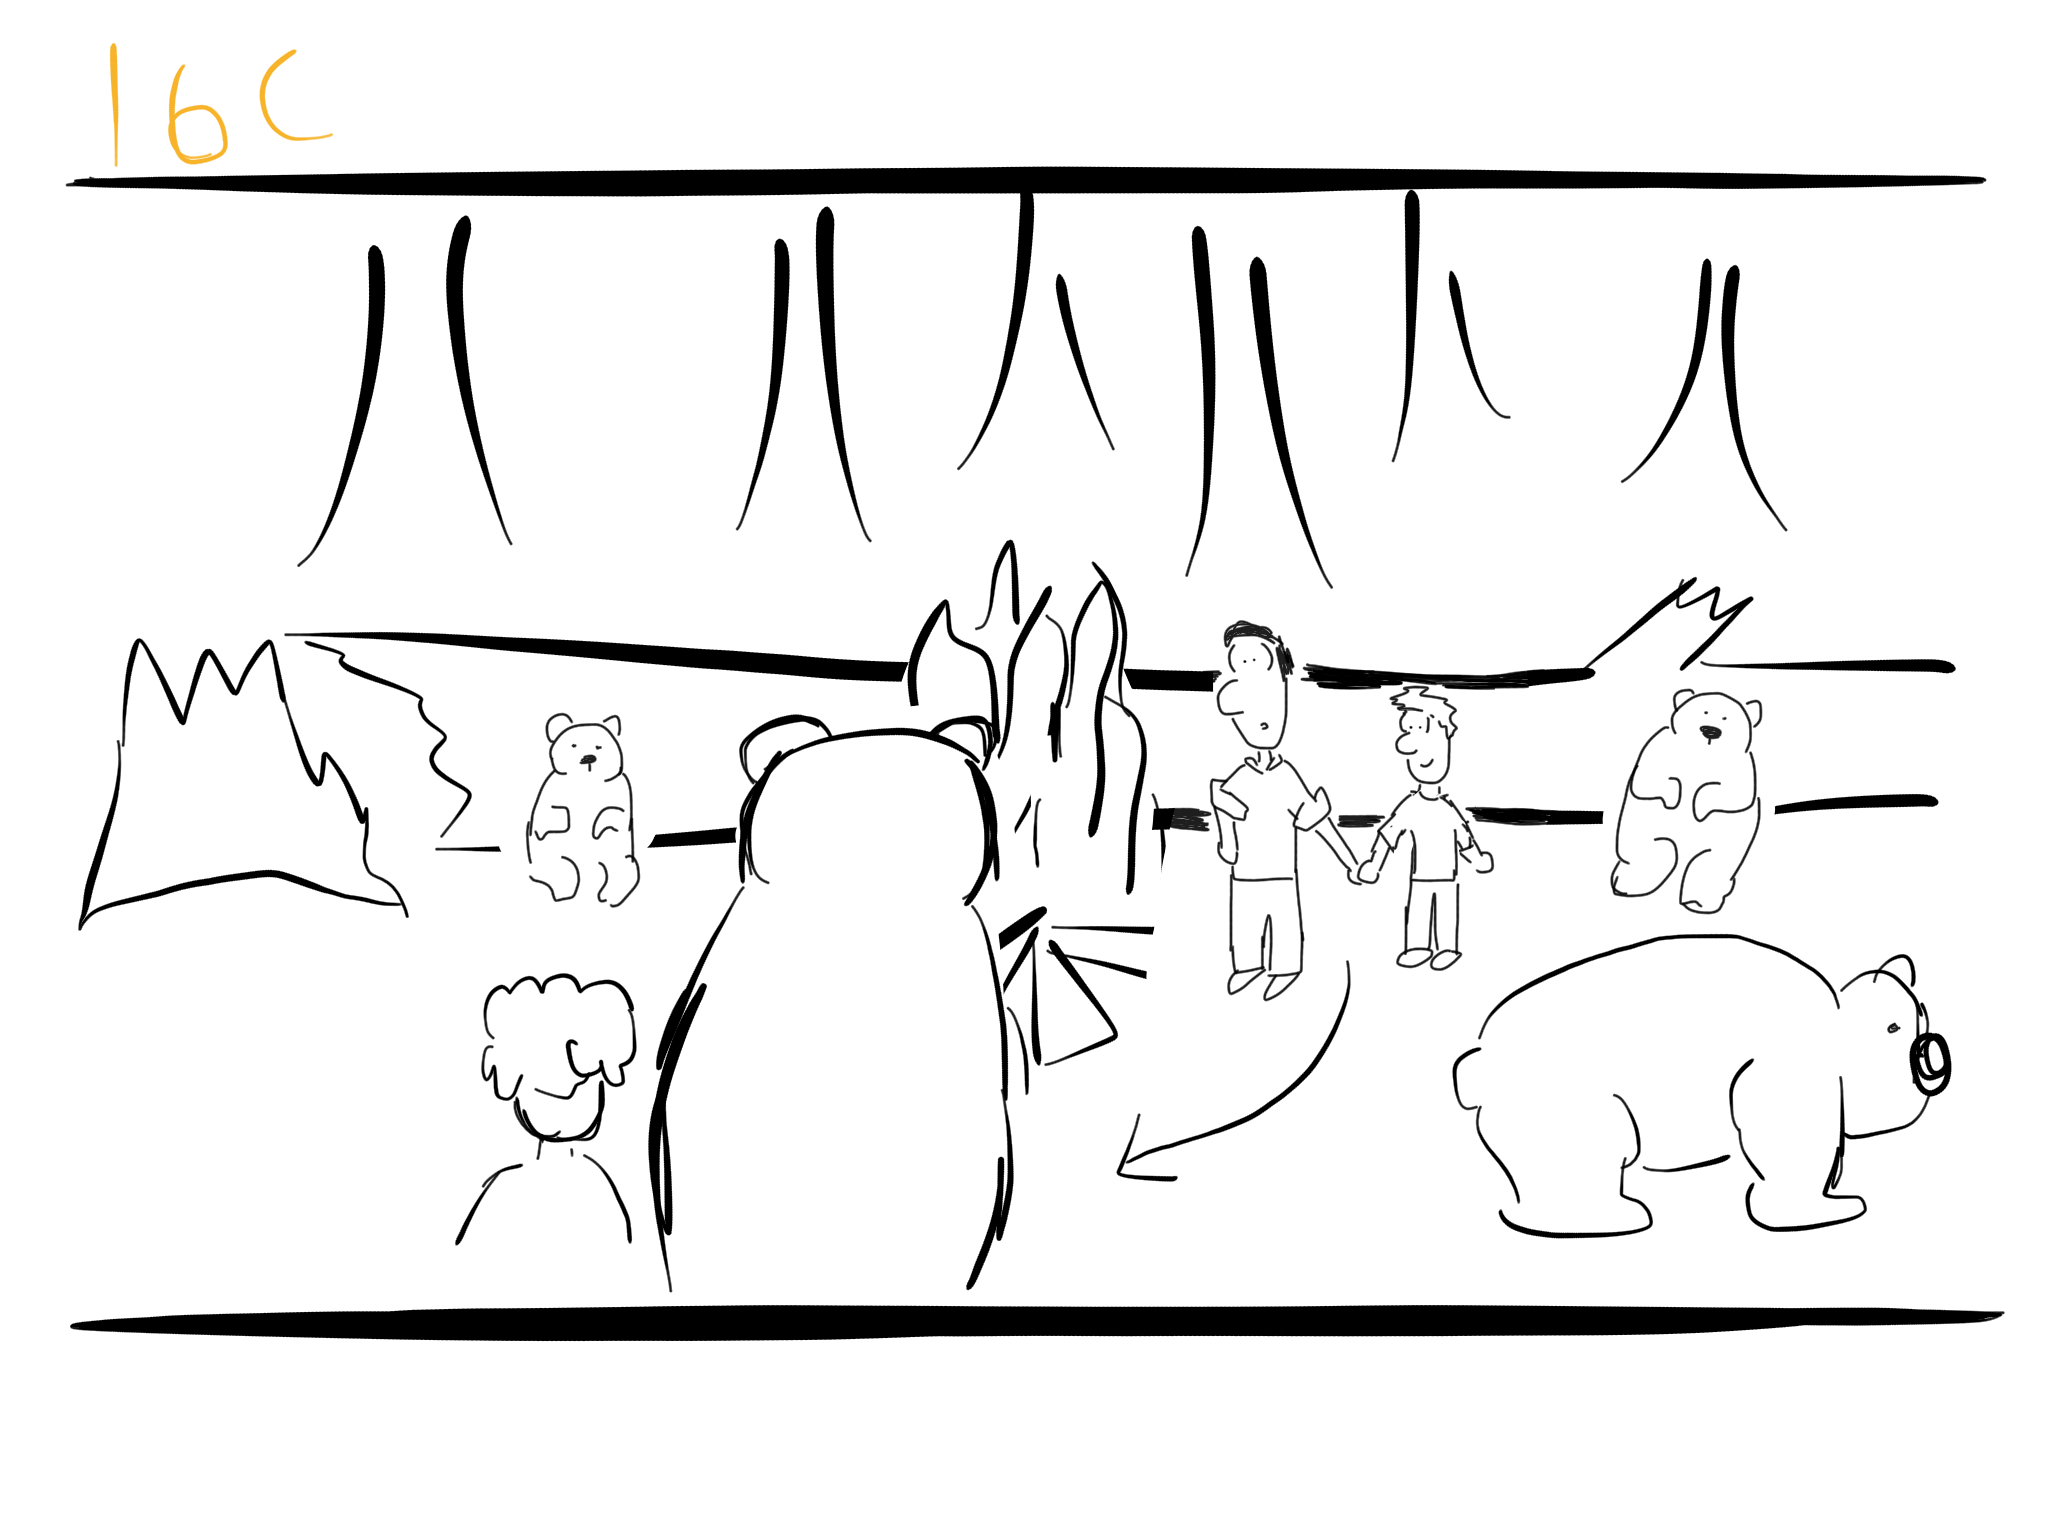 BDF_Storyboards_64.jpg